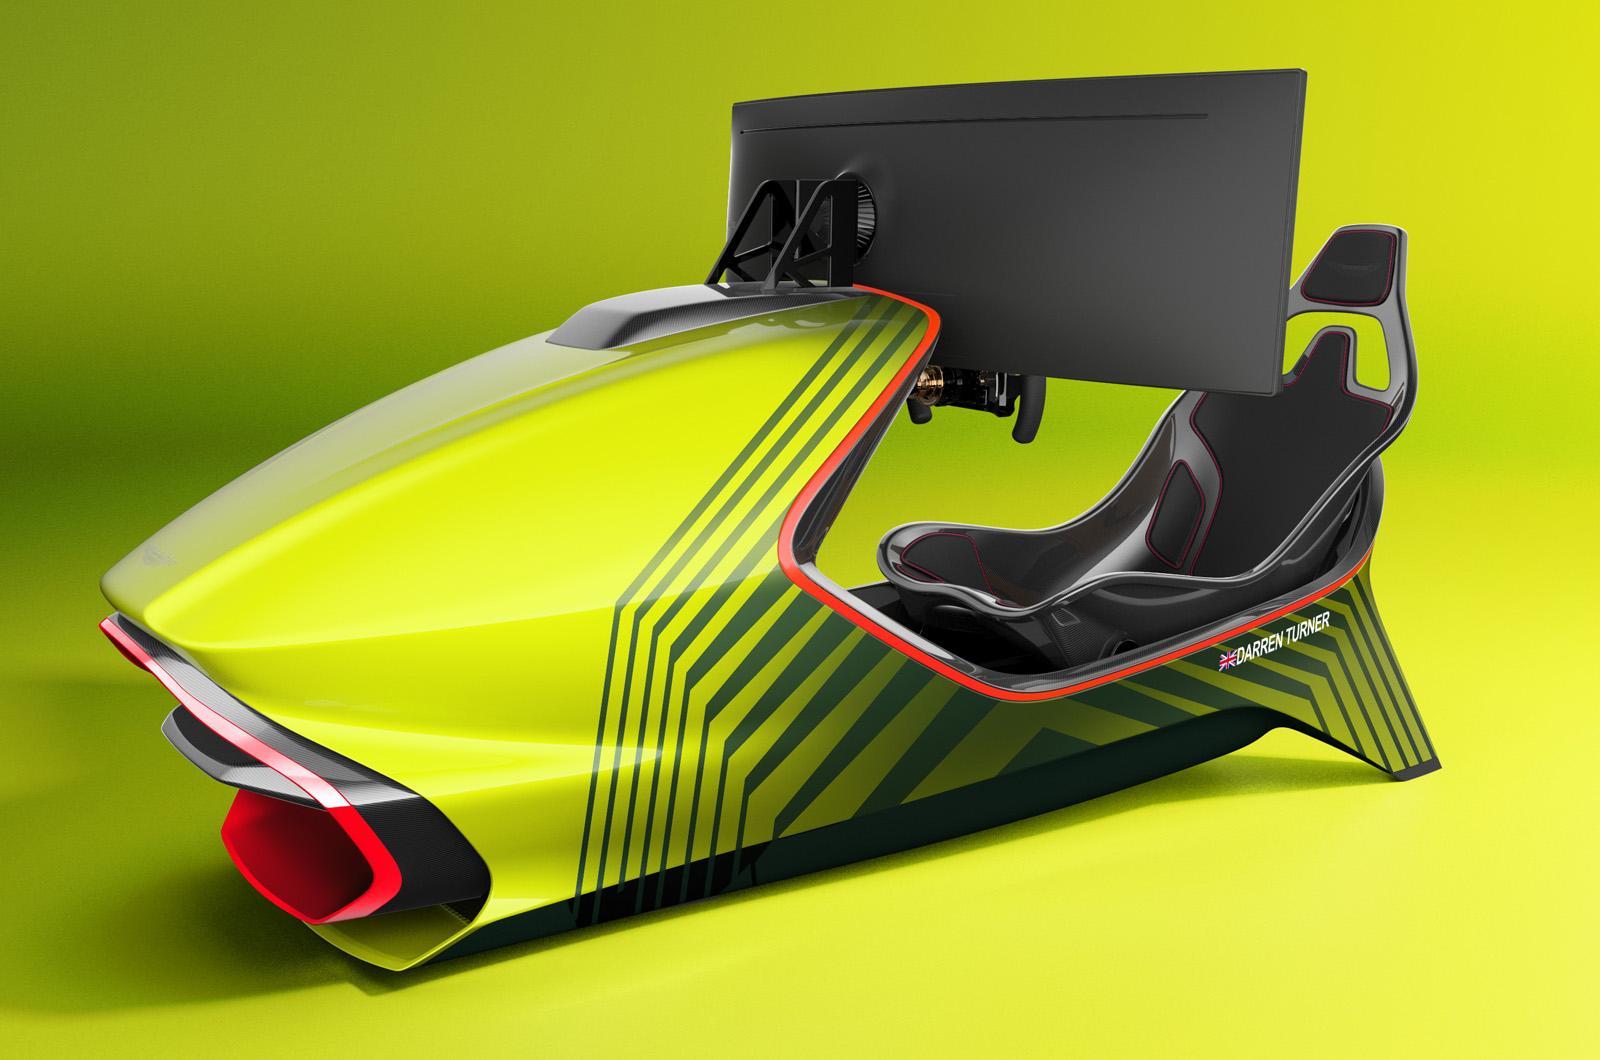 curv_x_aston_martin_amr-c01_racing_simul